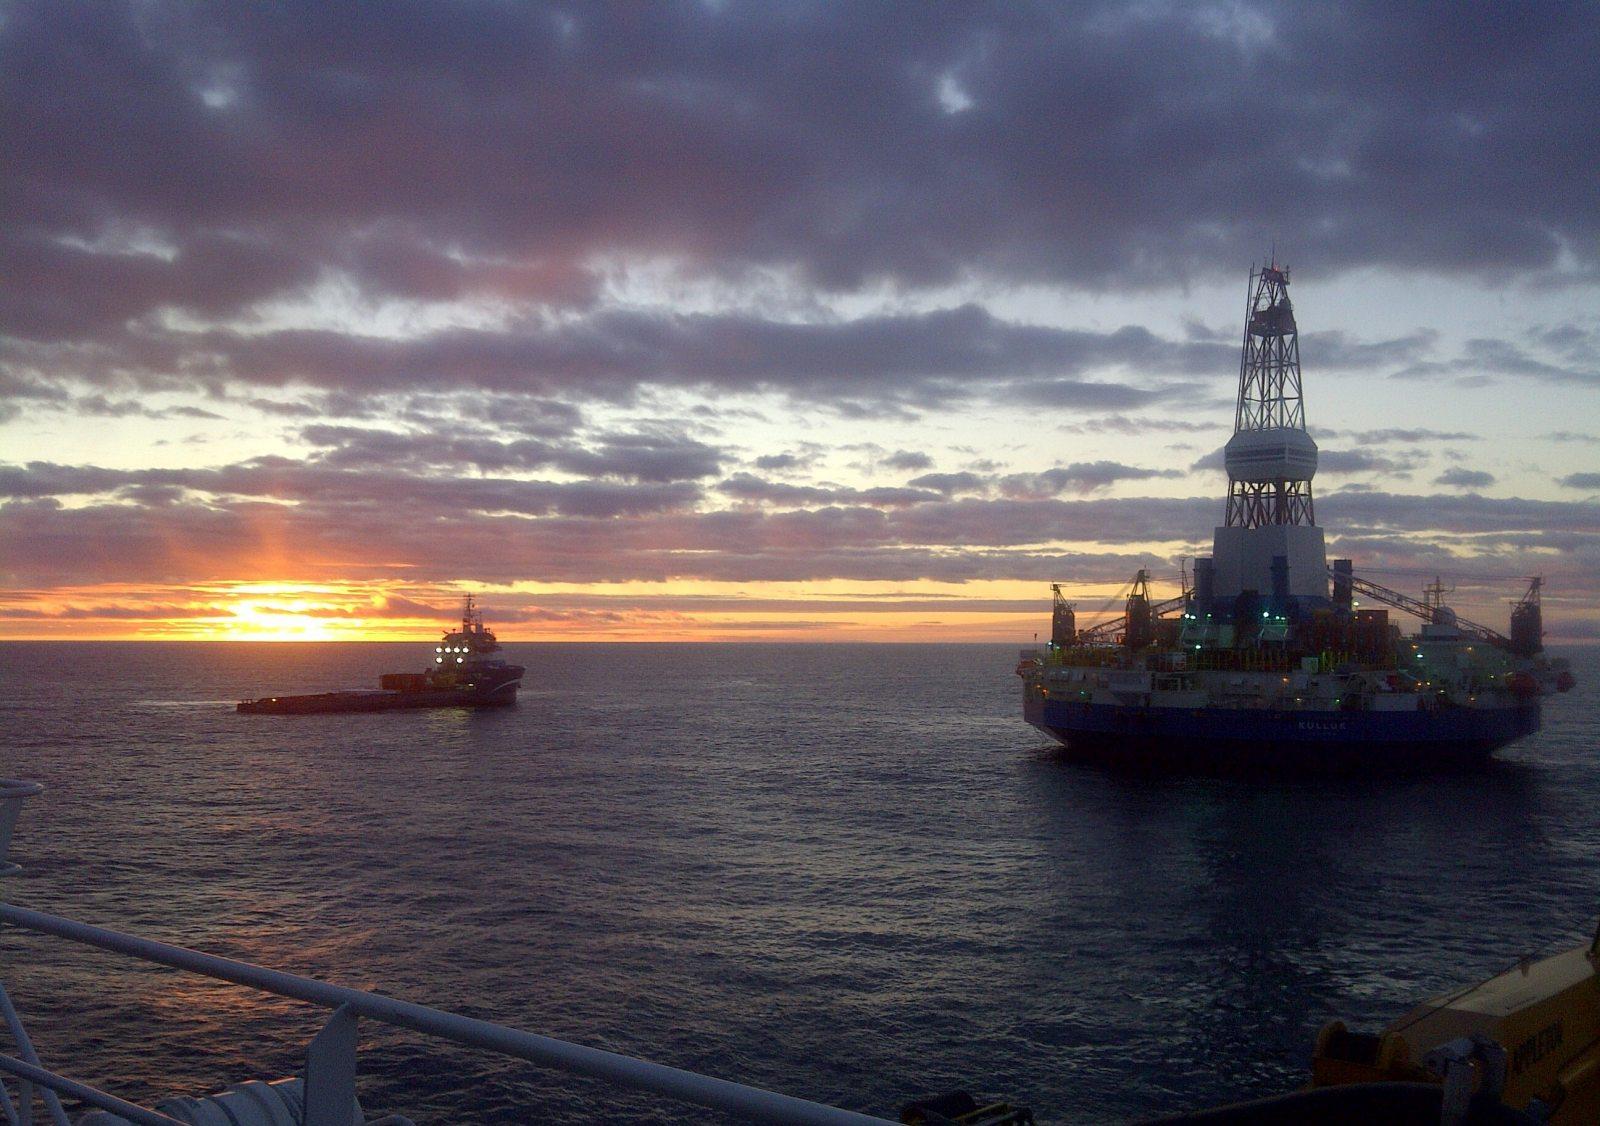 Royal Dutch Shell's Kulluk drillship in the Beaufort Sea in fall 2012. Photo: Royal Dutch Shell. Alaska Dispatch.